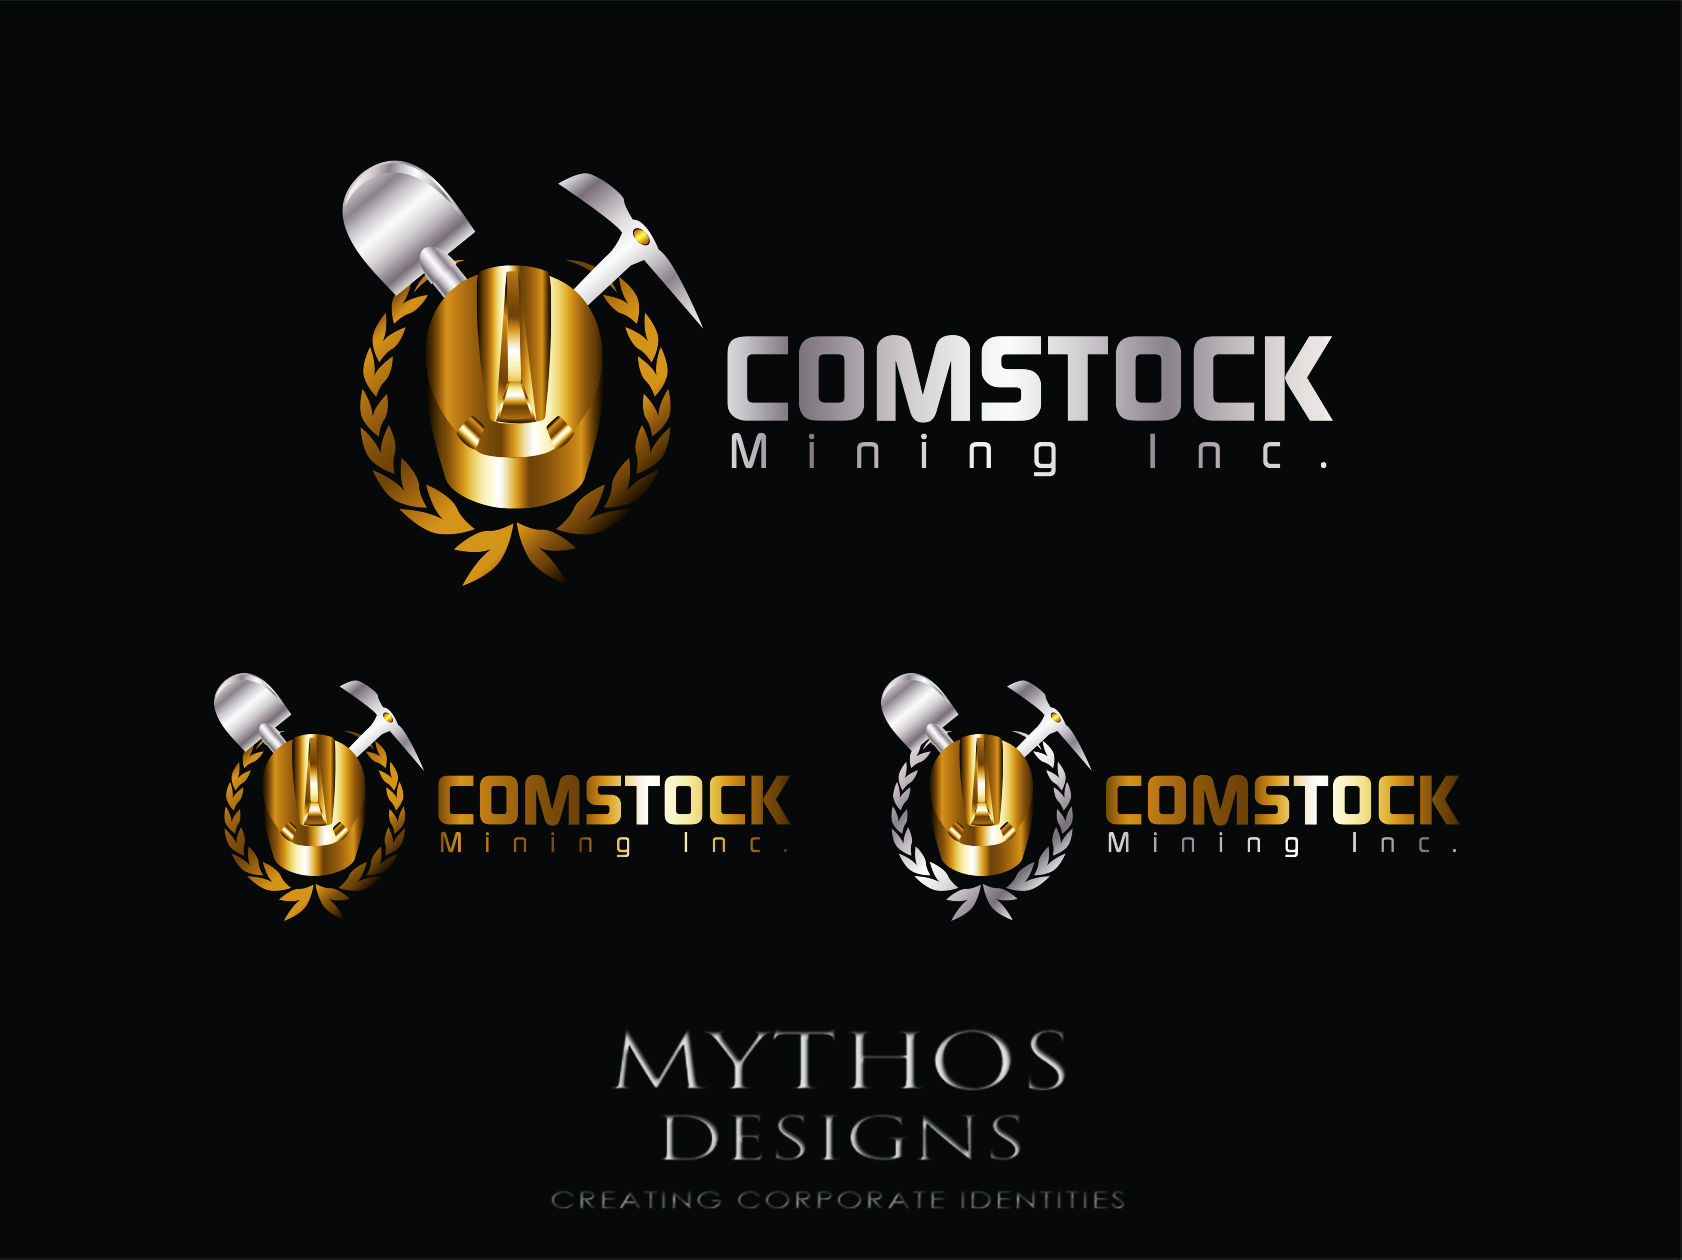 Logo Design by Mythos Designs - Entry No. 160 in the Logo Design Contest Captivating Logo Design for Comstock Mining, Inc..